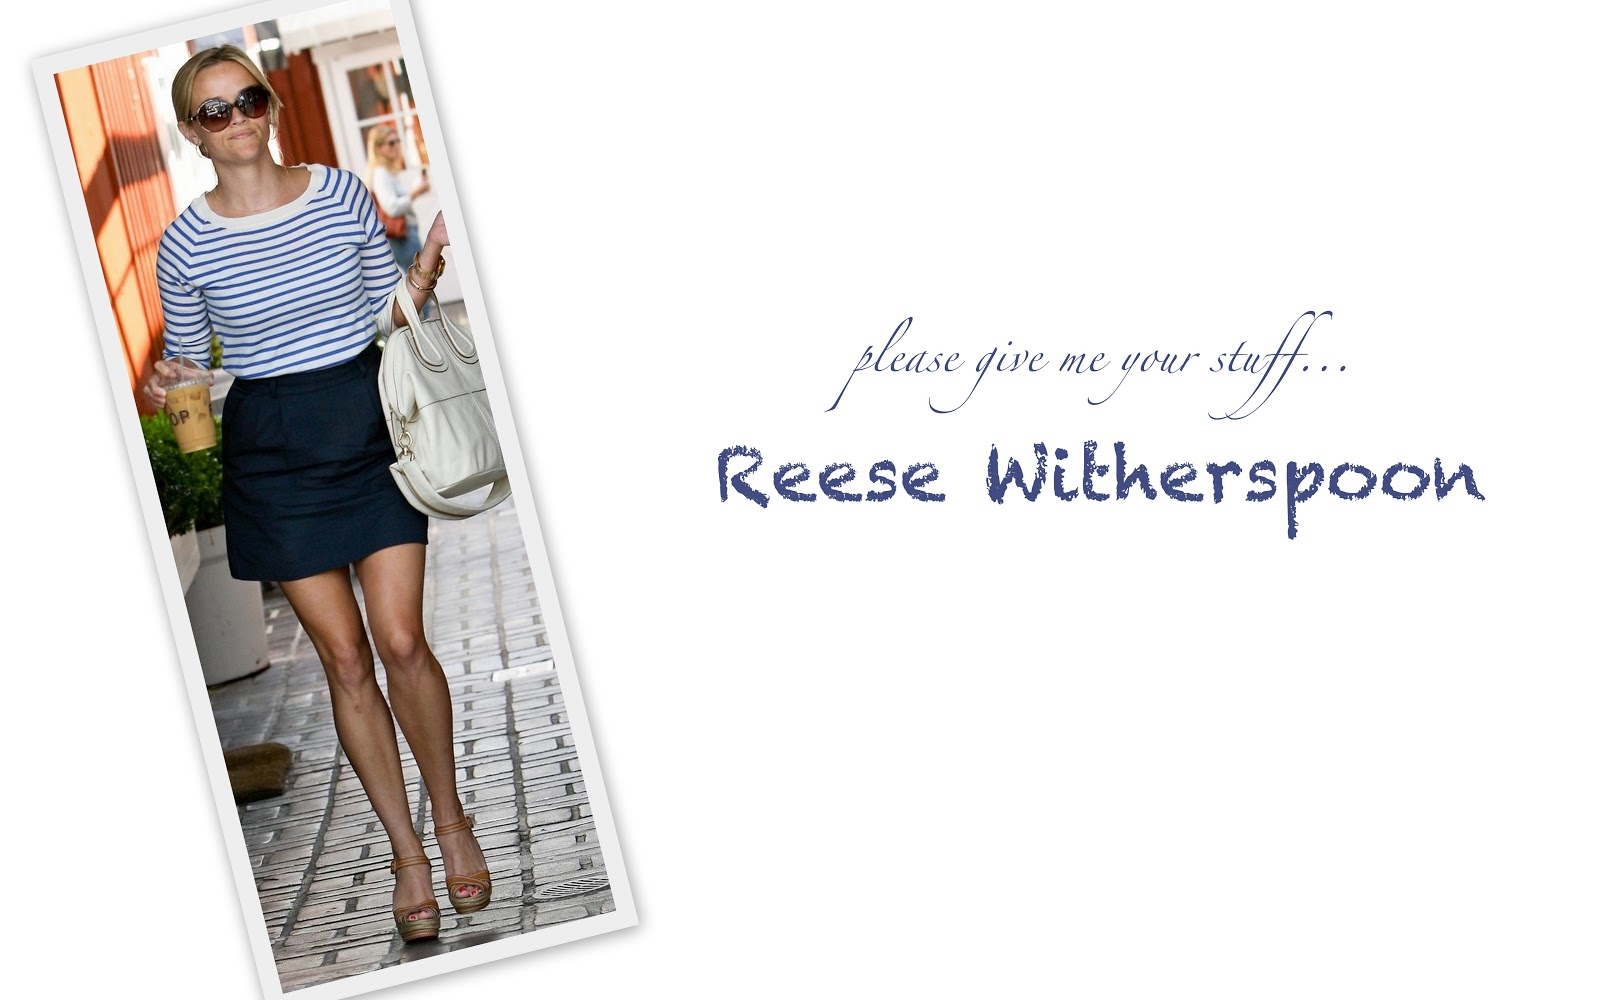 http://4.bp.blogspot.com/-Si217j1Im_A/TllymzF5uFI/AAAAAAAAFSk/nbvZKwq9YO0/s1600/Reese+Witherspoon+casual+stype+striped+shirt.jpg